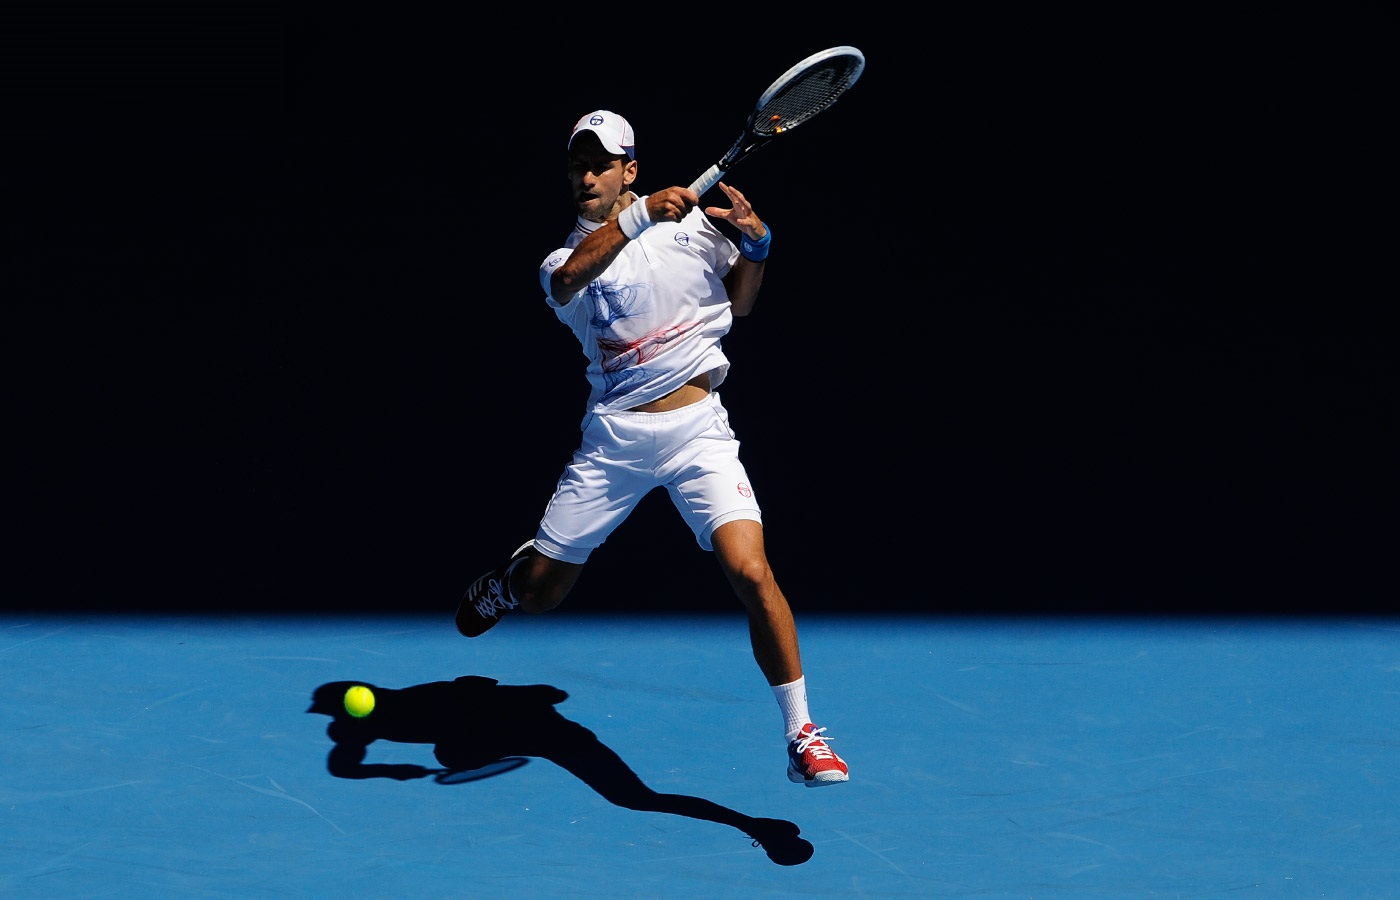 Download Novak Djokovic Latest HD Wallpaper 1400x900